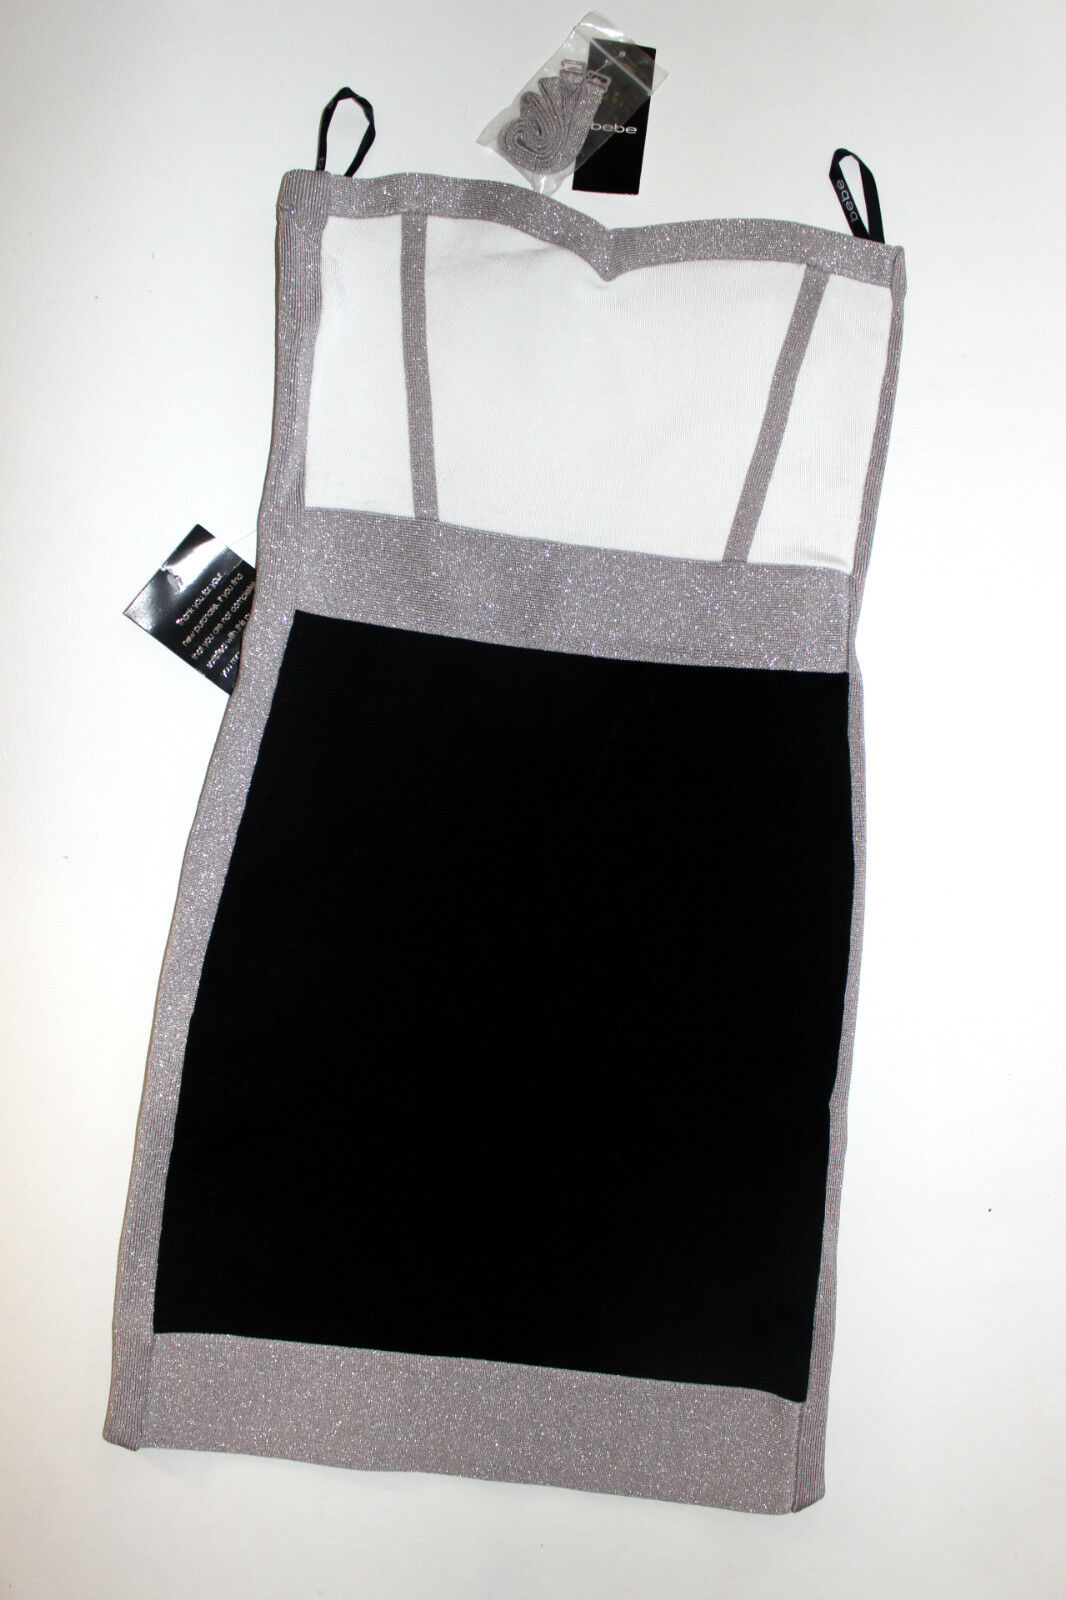 NWT bebe schwarz Weiß shimmery strapless Farbeblock bandage top dress M fits 4 6